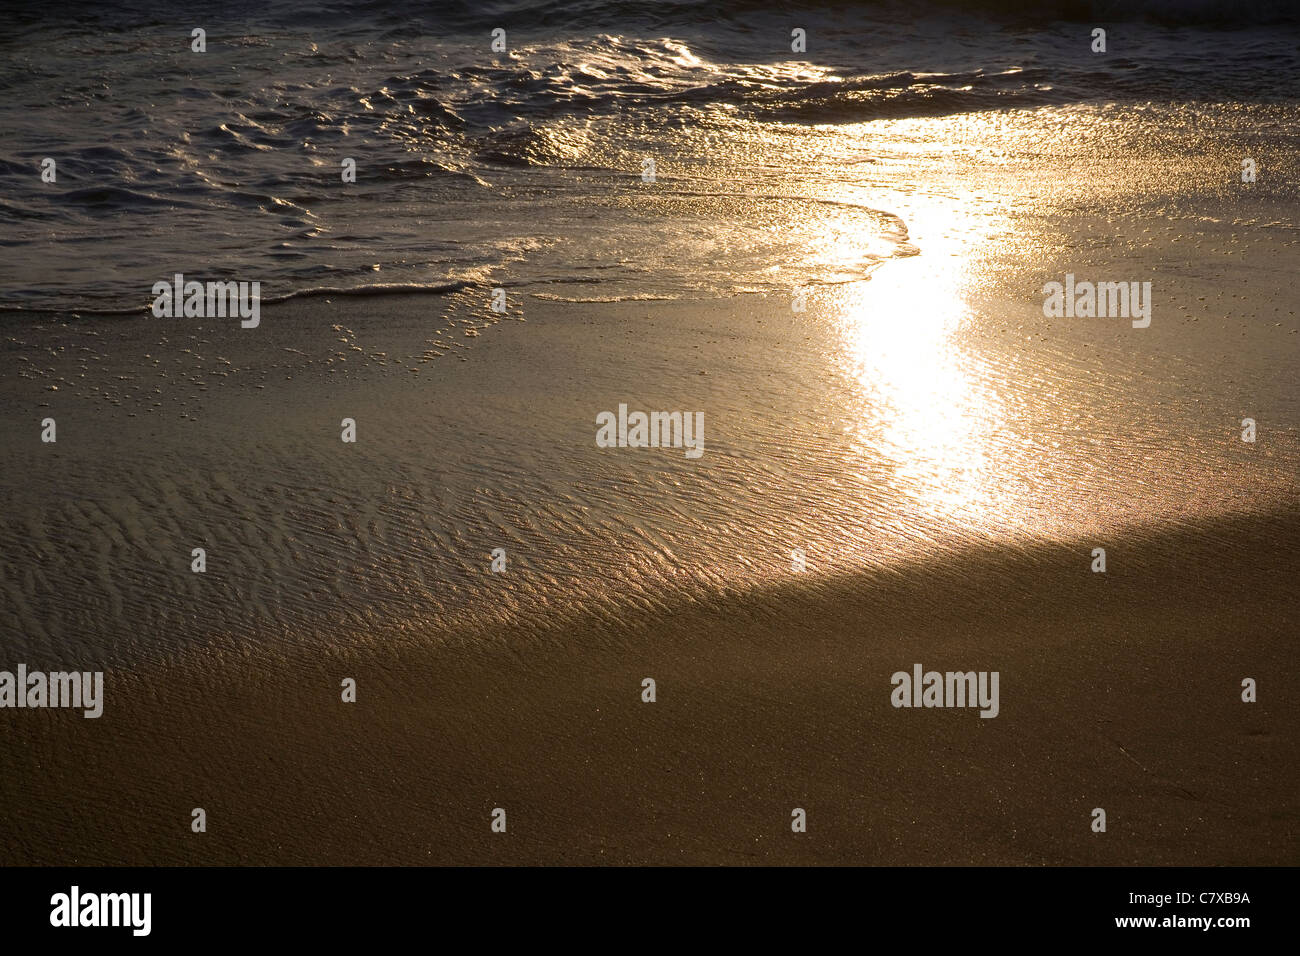 Sun glares off wet sand on water's edge - Stock Image